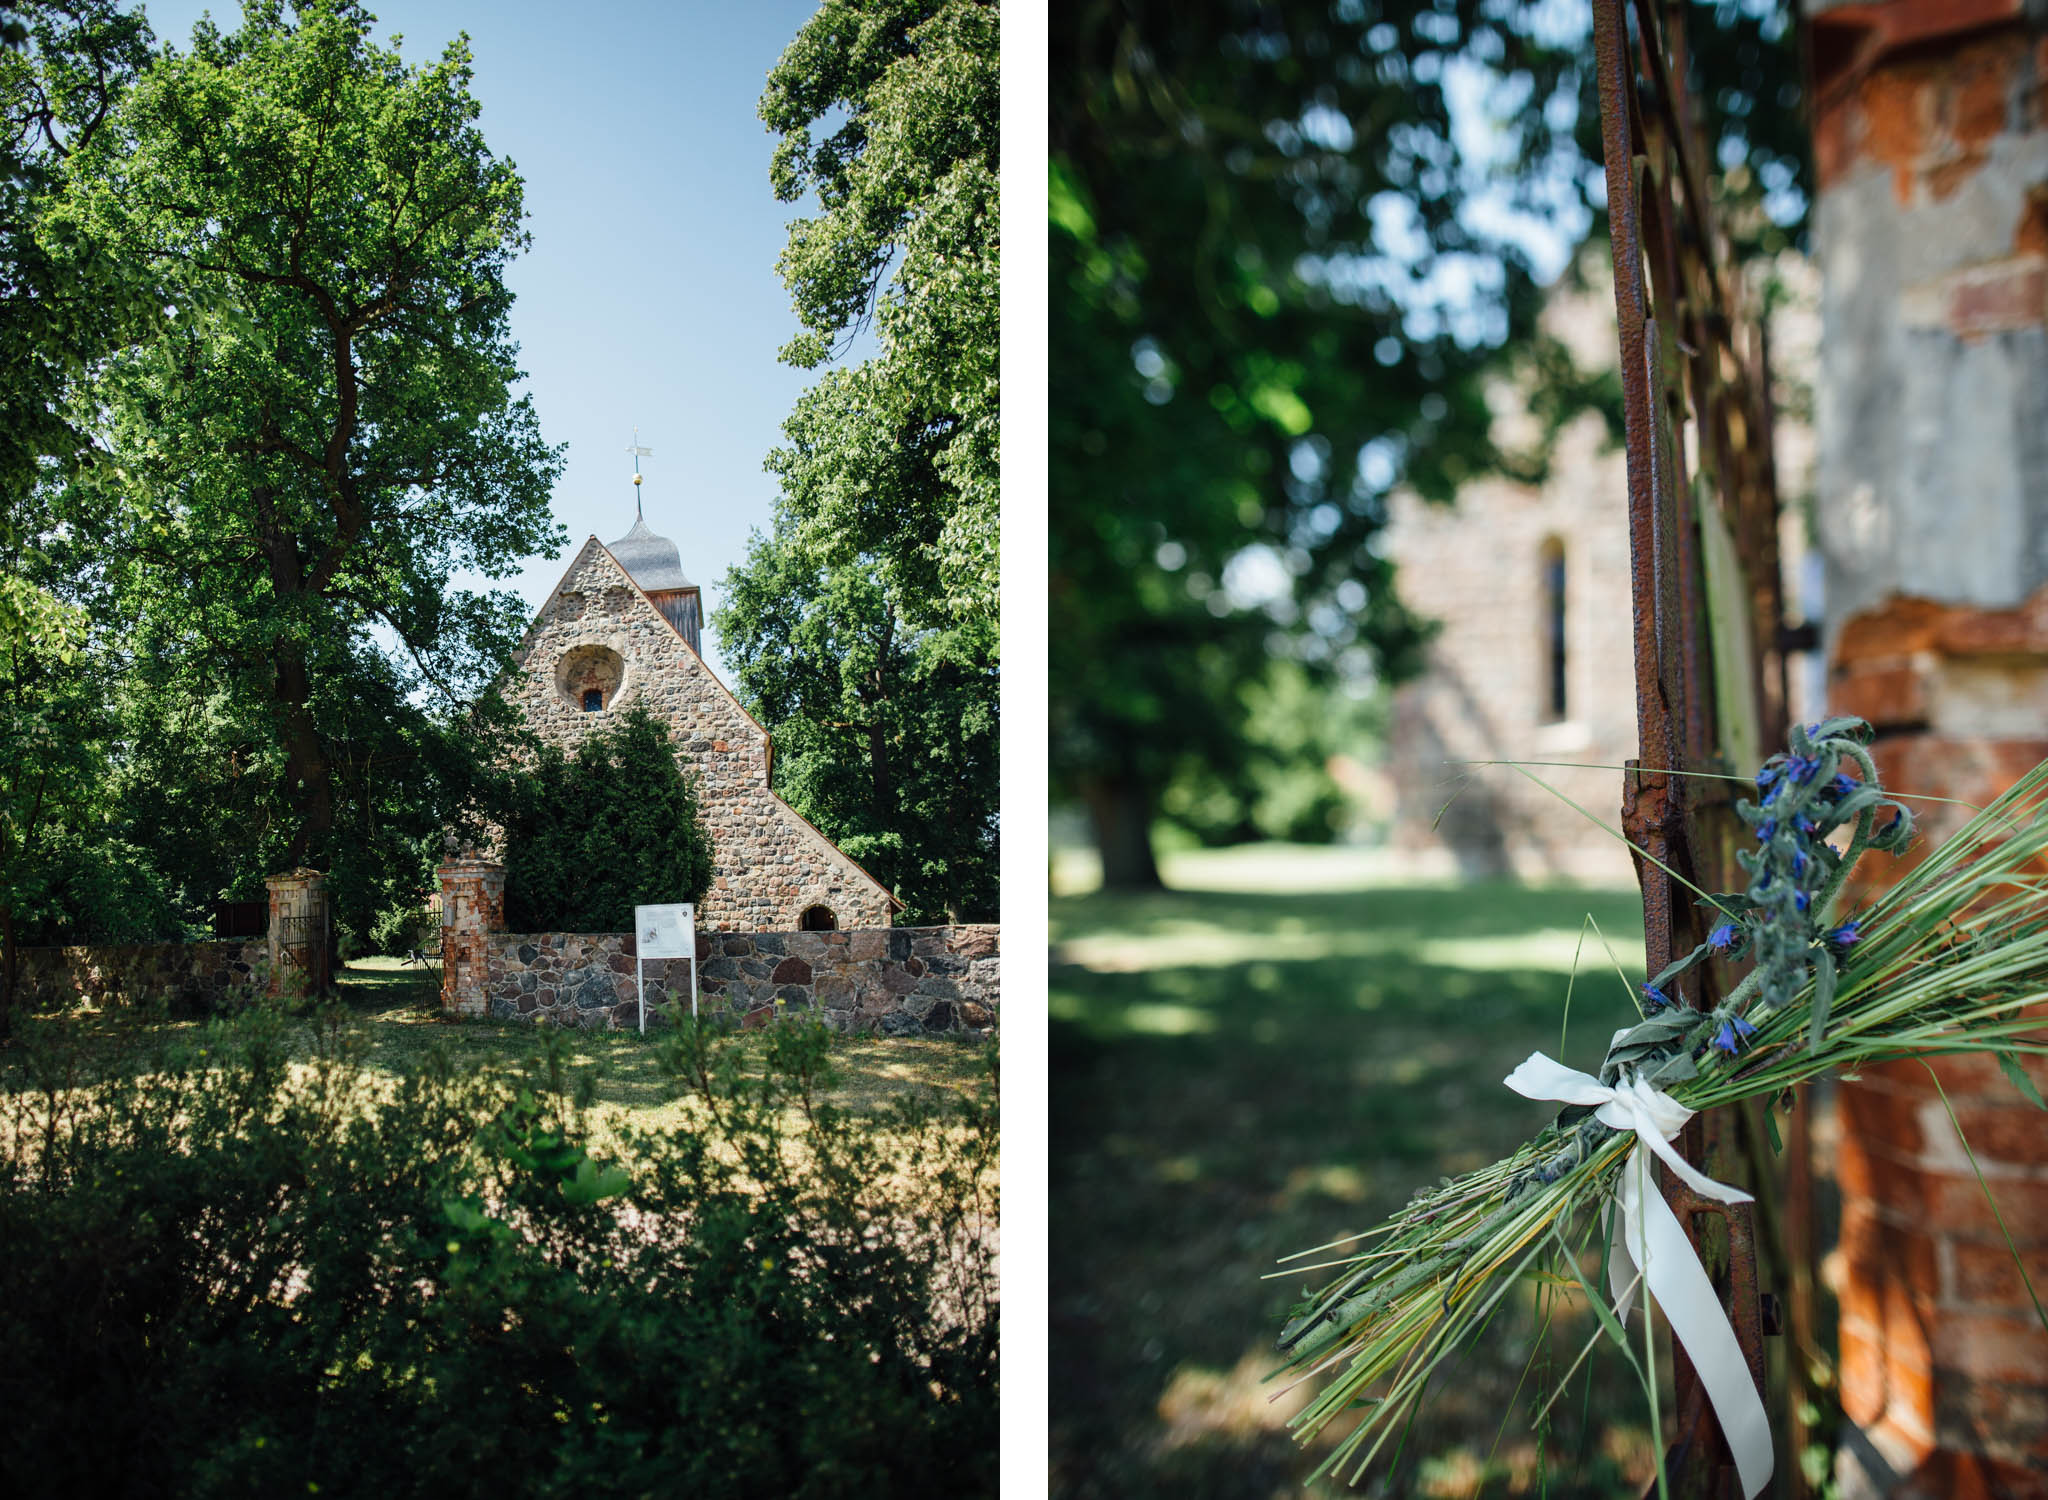 dorfkirche-strehlow-heiraten-uckermark